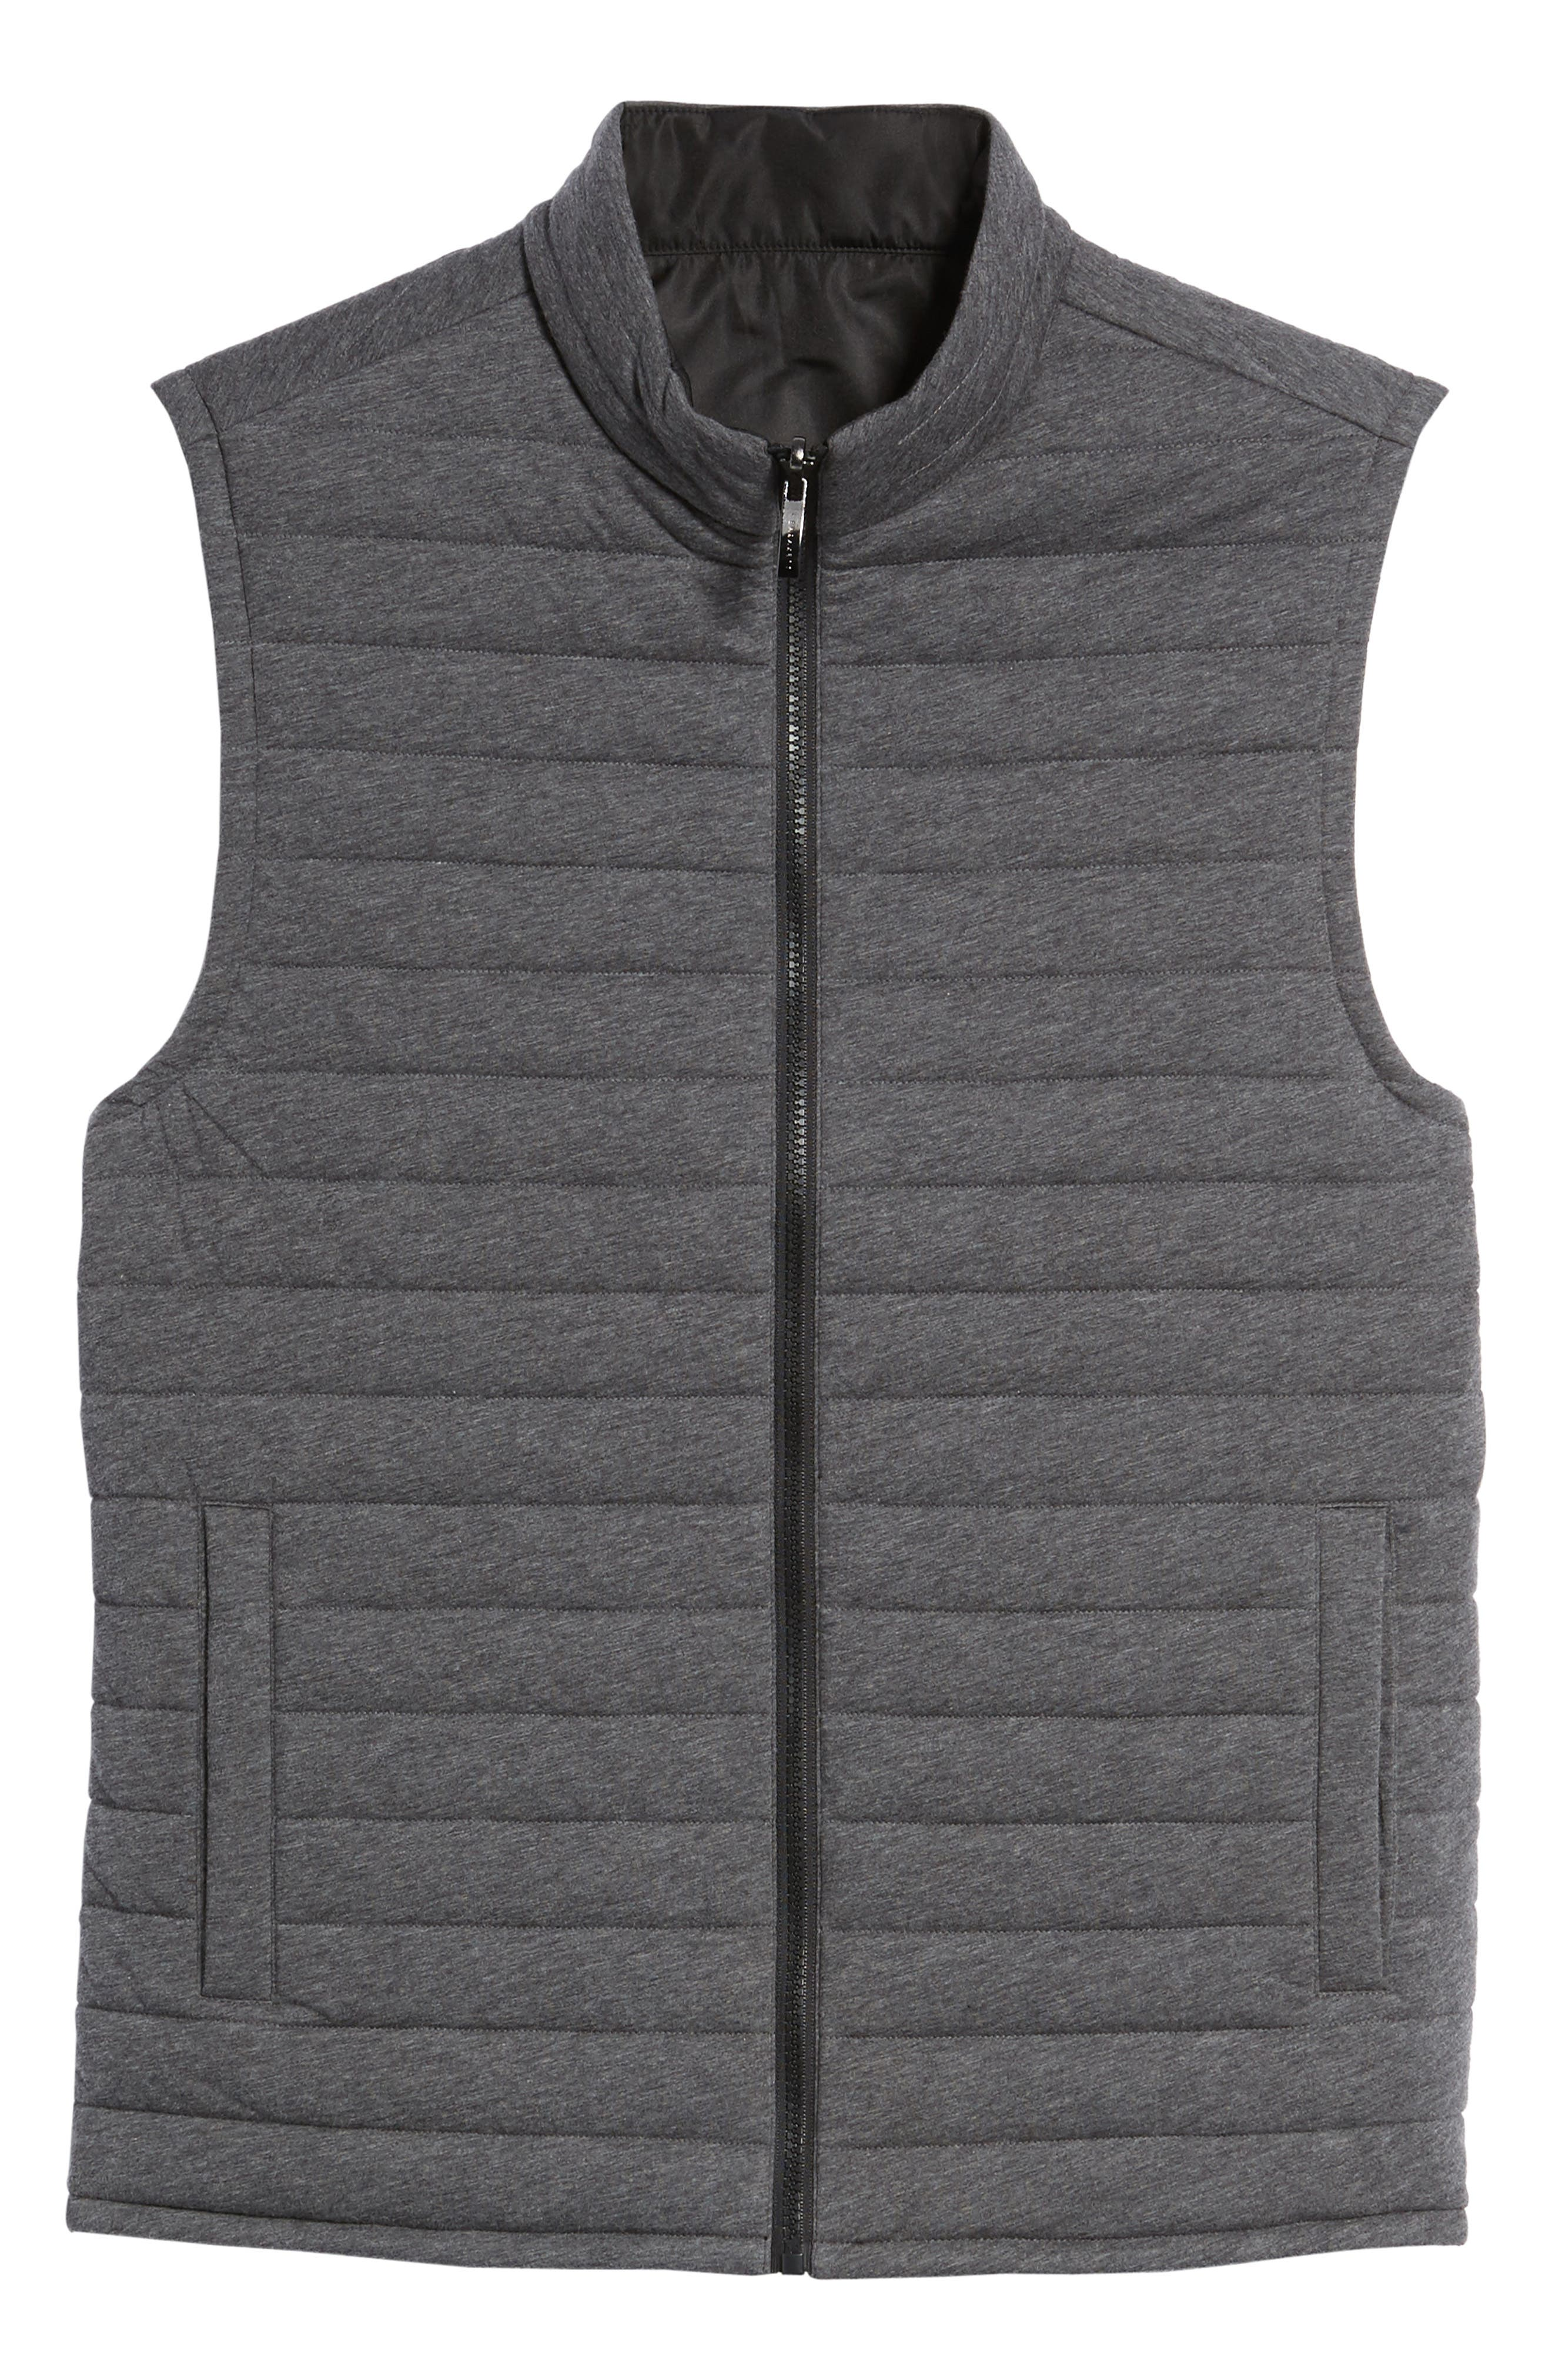 Gallagher Reversible Vest,                             Alternate thumbnail 5, color,                             Charcoal